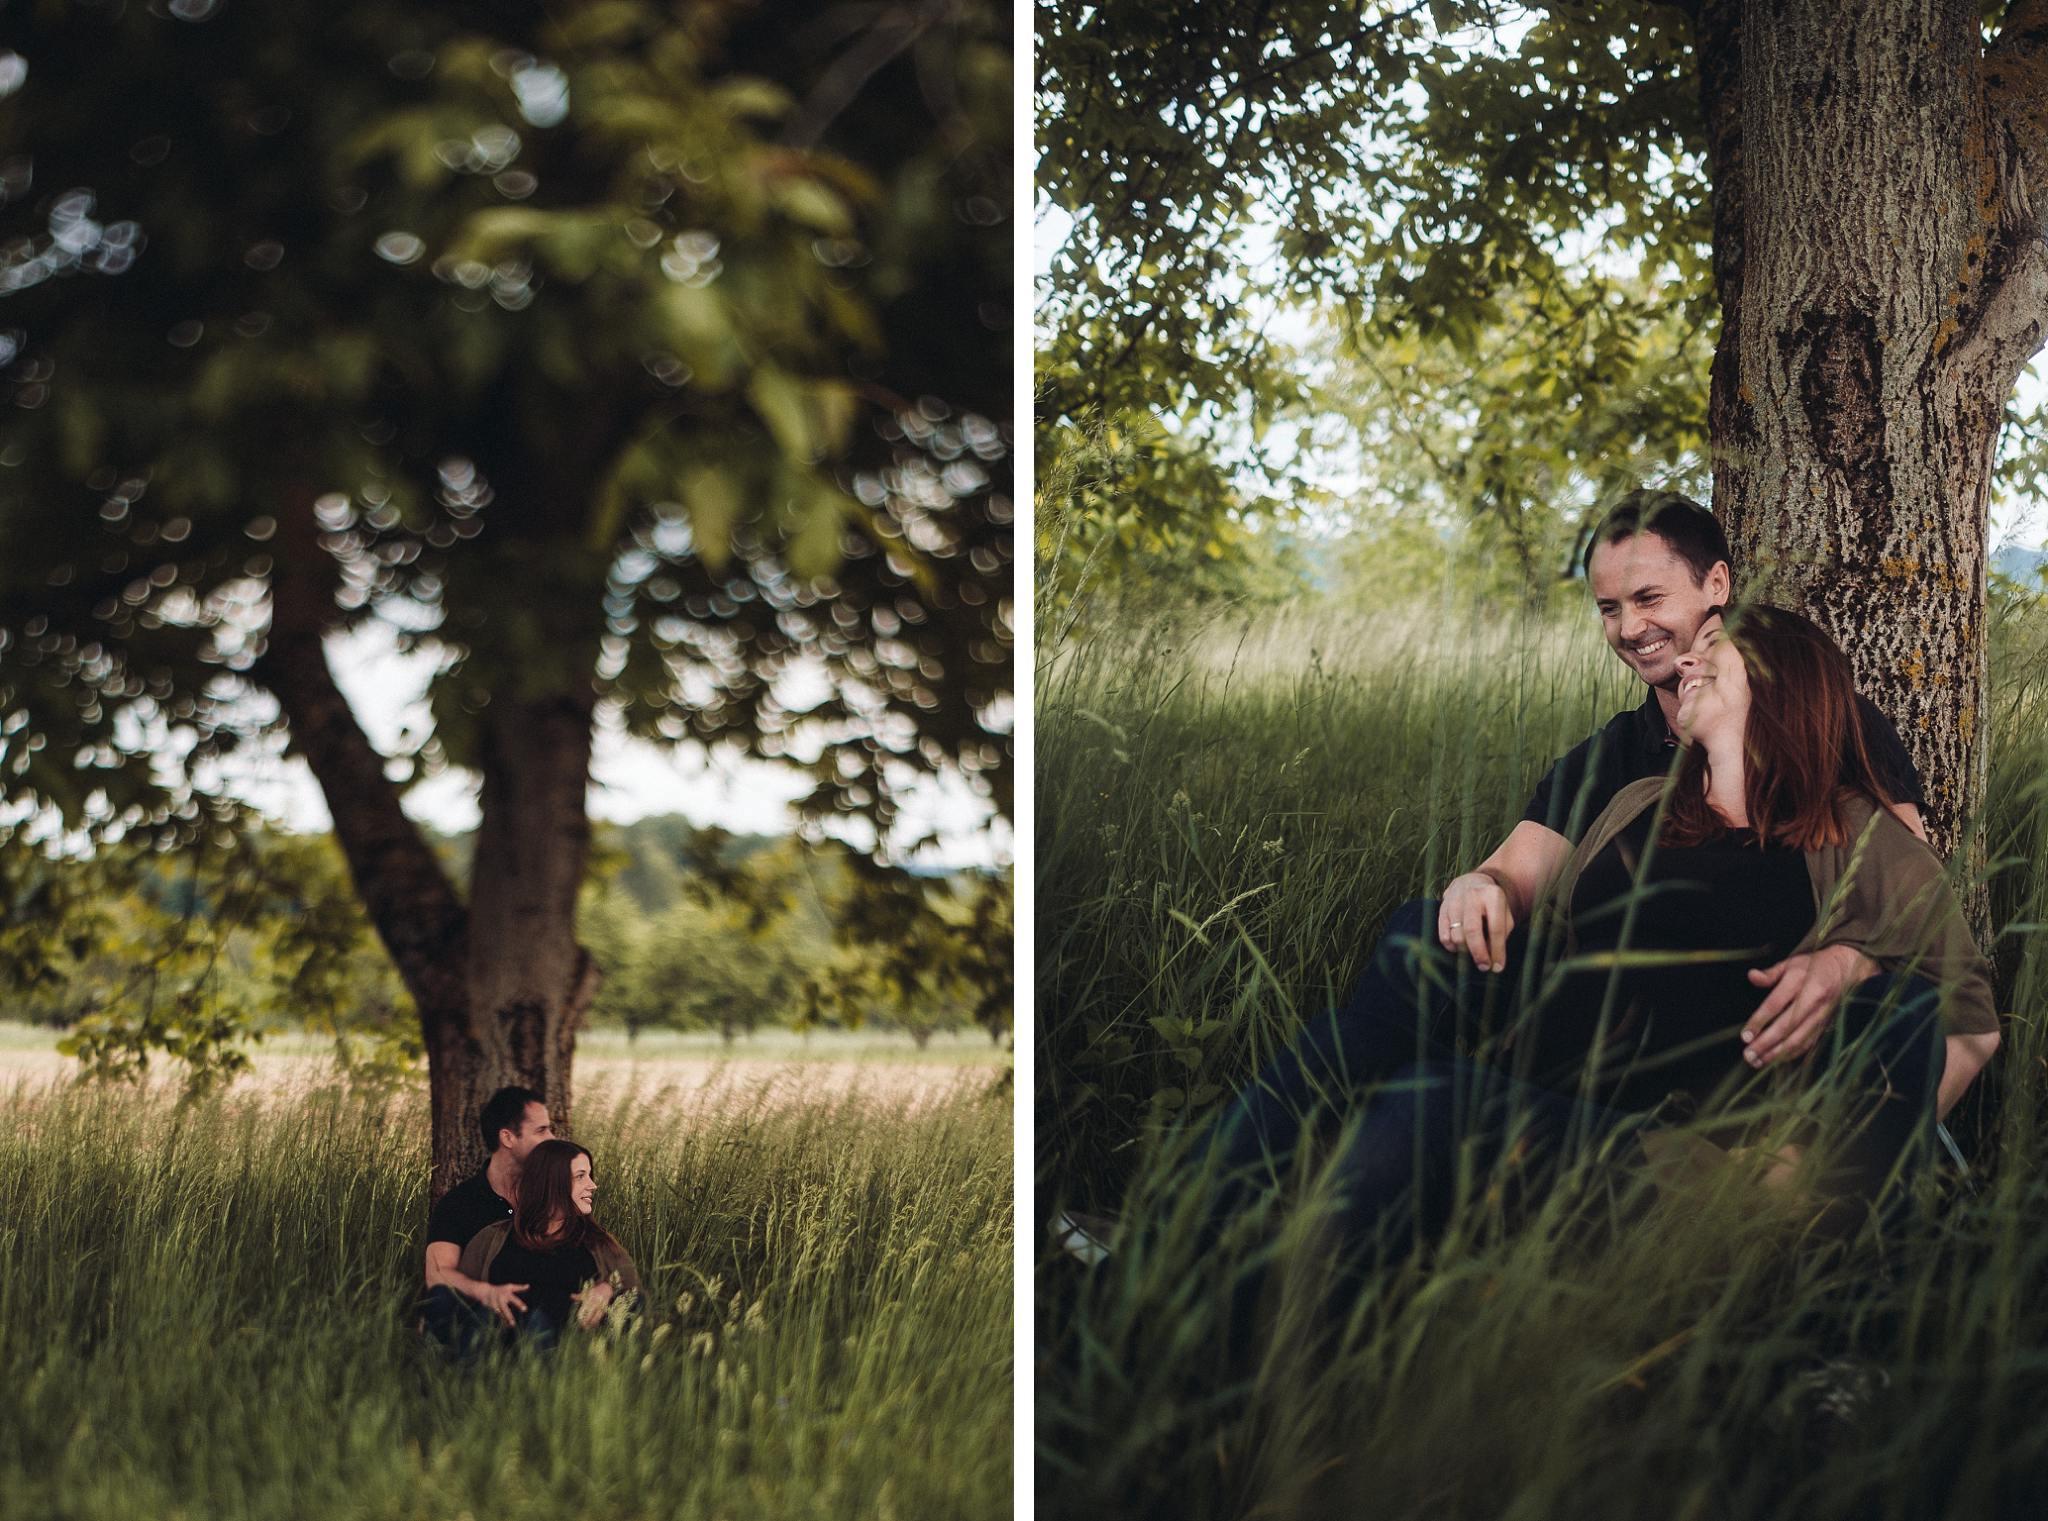 babybauch-shooting-fotograf-offenburg-elgersweier_0020.jpg